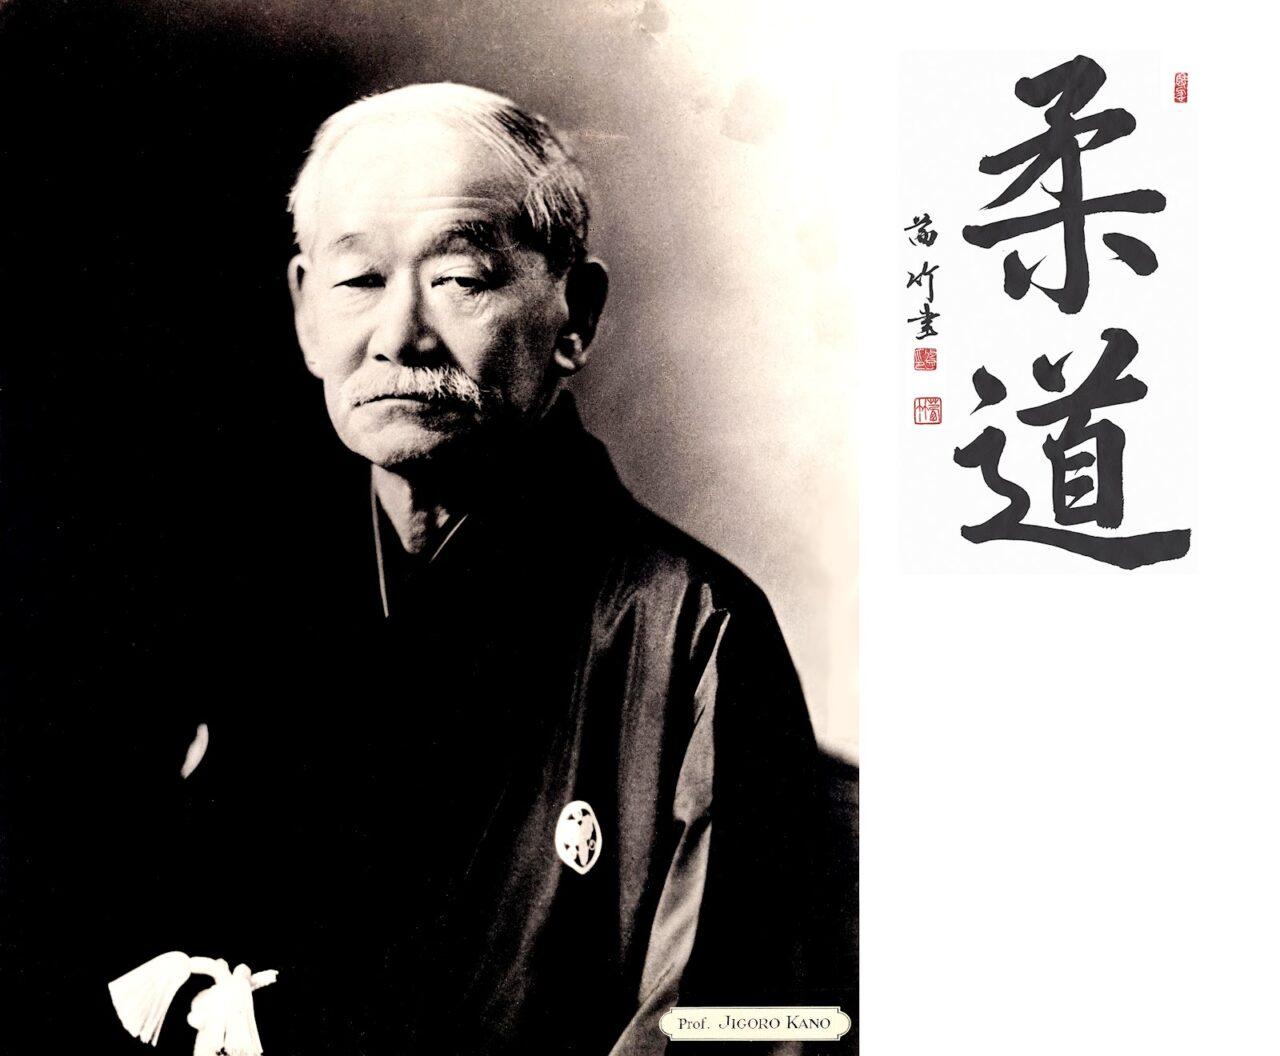 Professor Jigoro Kano in 1882